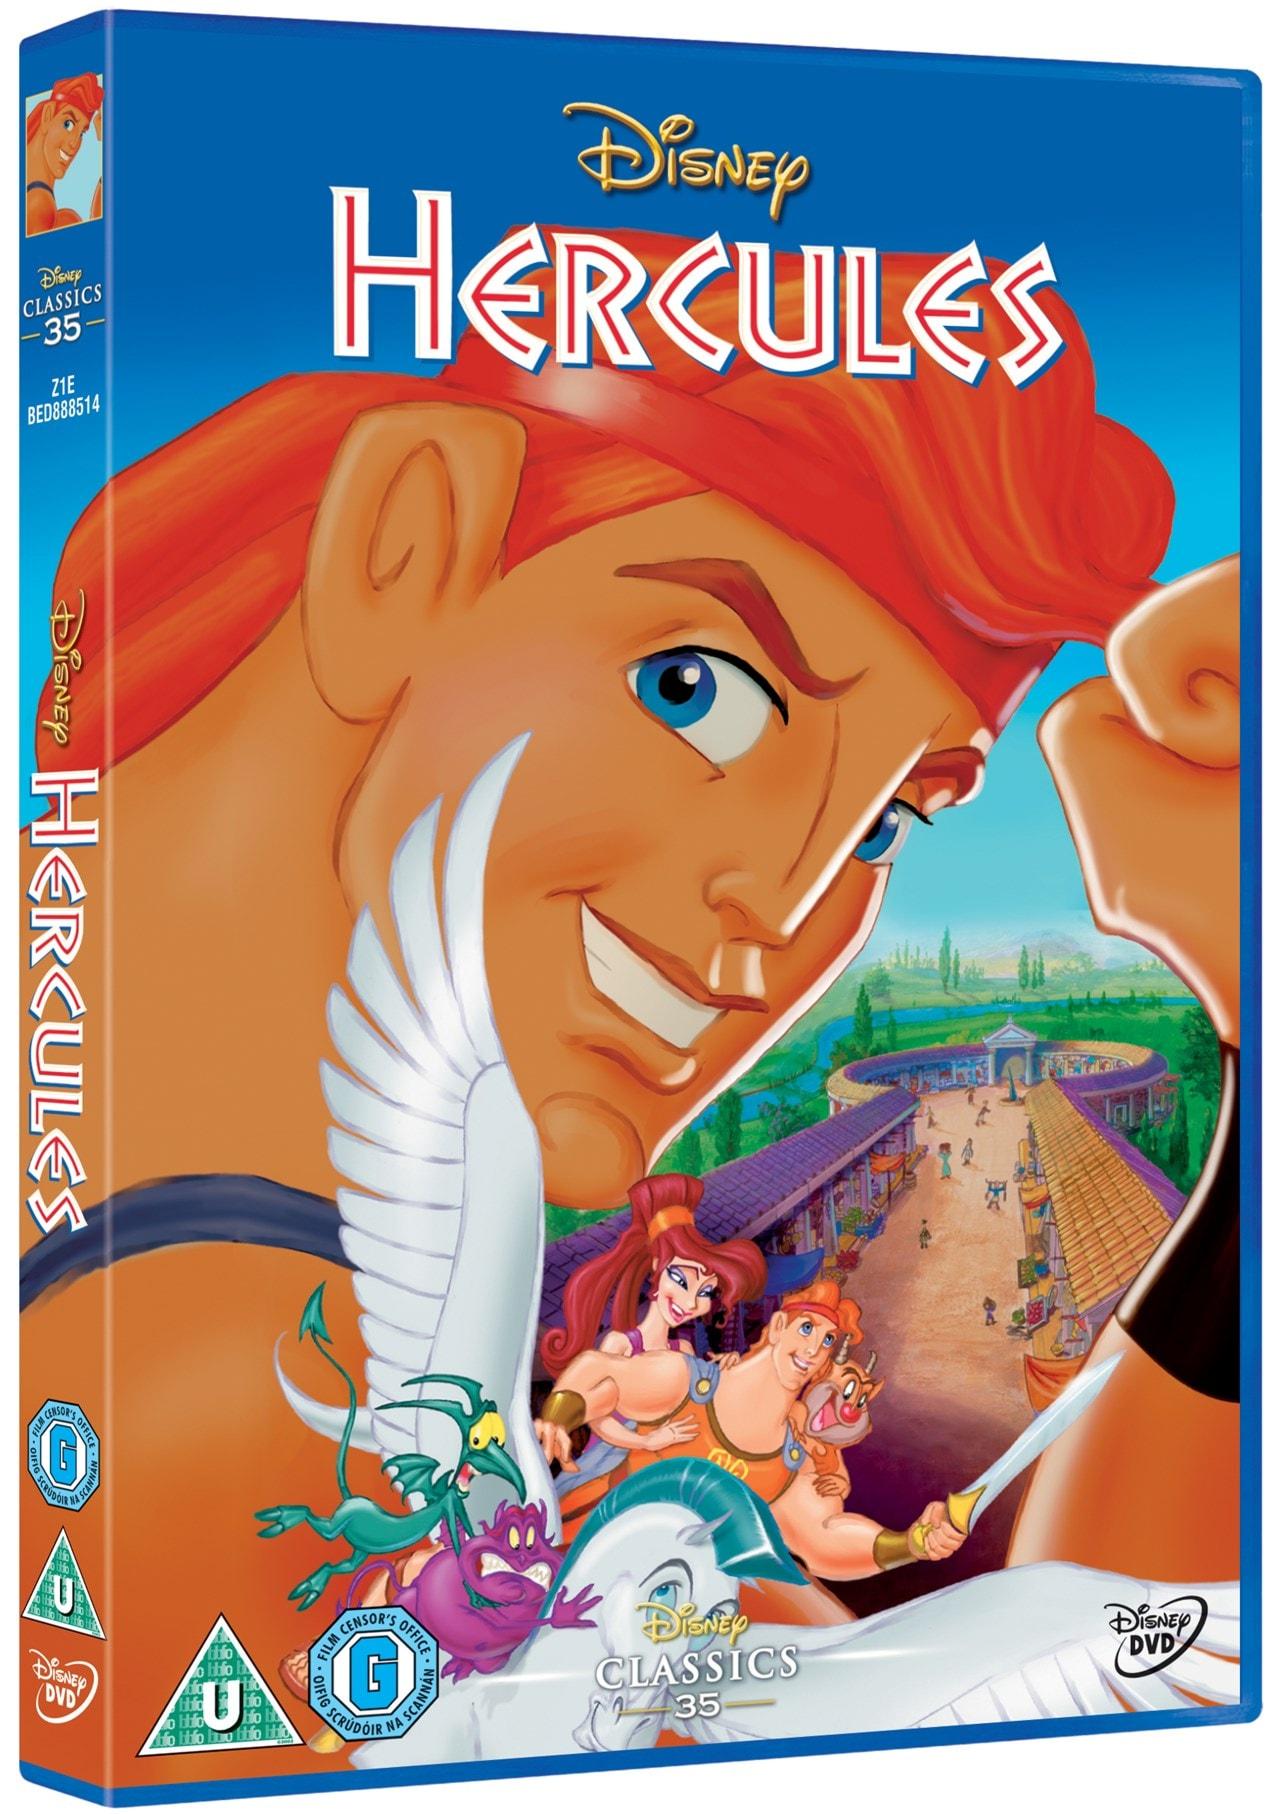 Hercules (Disney) | DVD | Free shipping over £20 | HMV Store